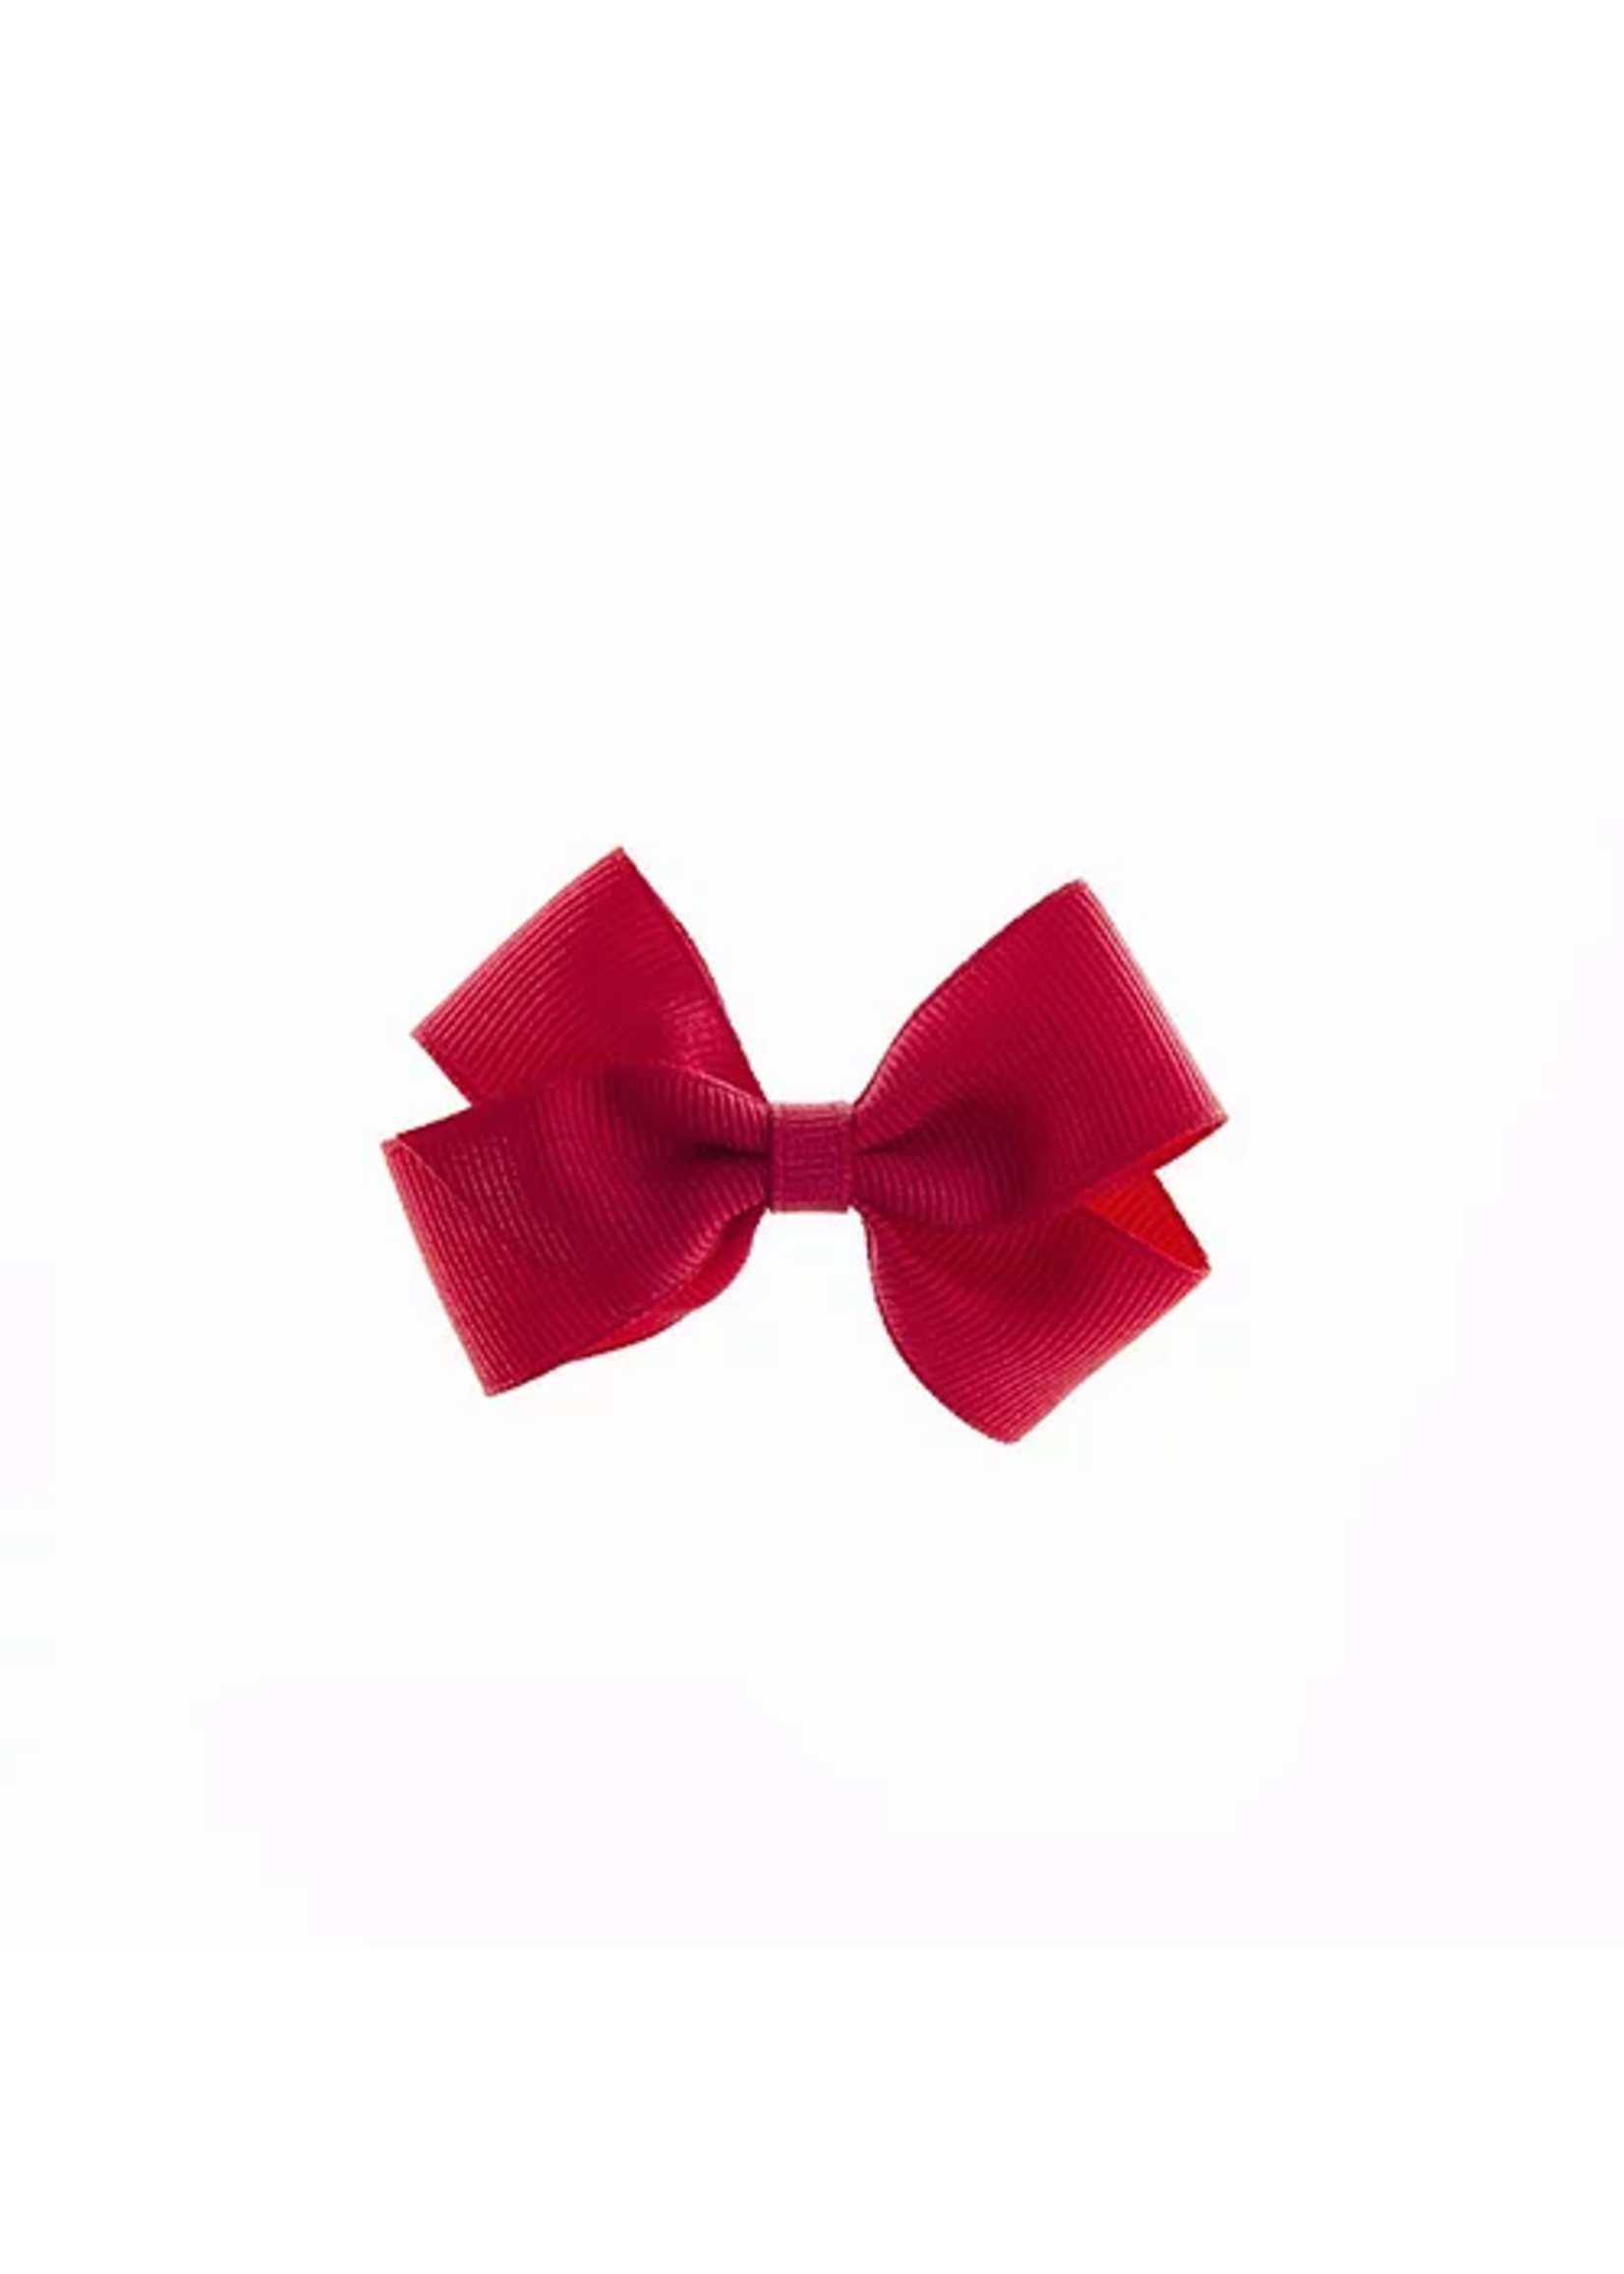 olilia Olilia Small London Bow (Scarlet)